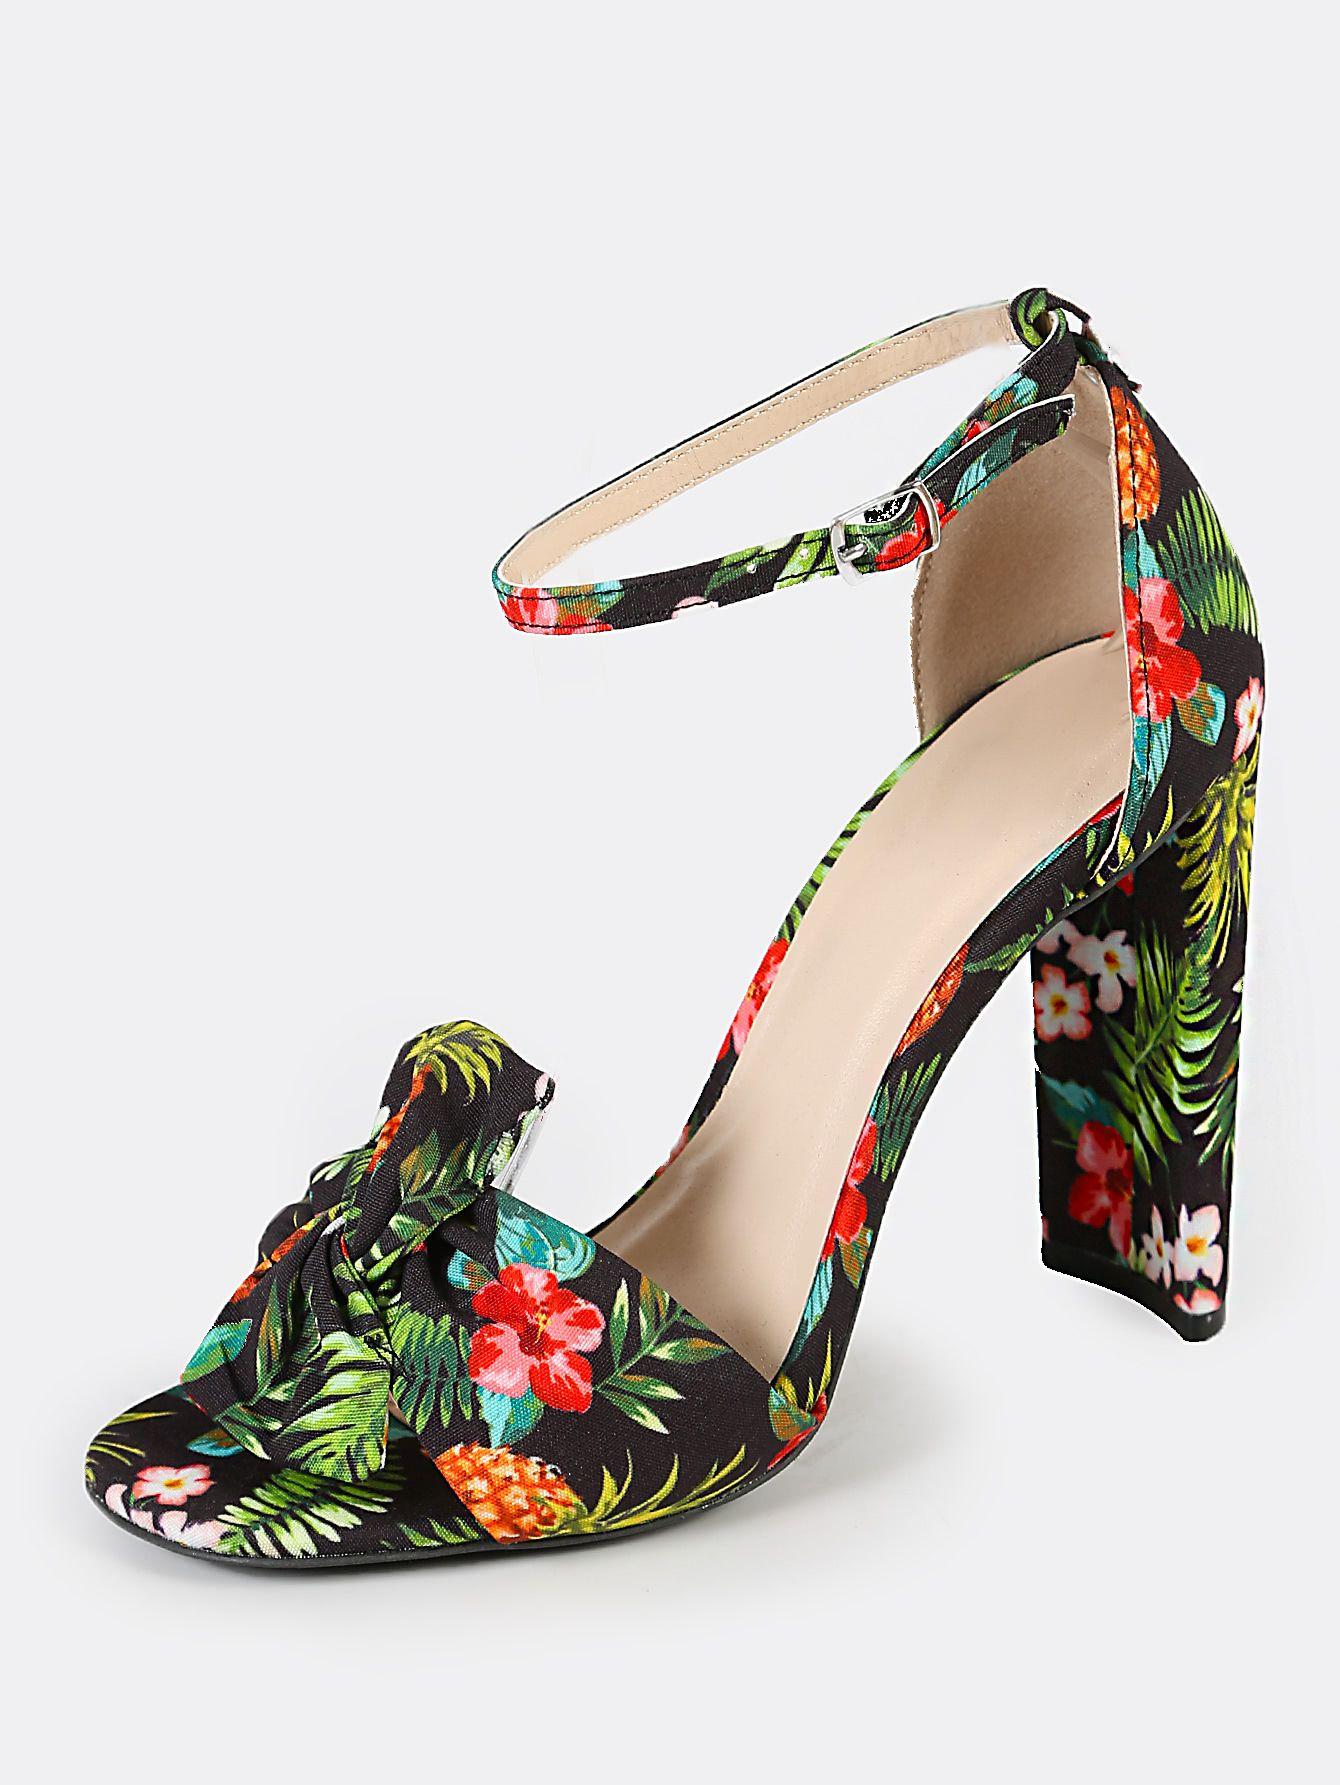 781c6d7d1fb4 Tropical Print Band Thin Ankle Cuff Peep Toe Heel BLACK MULTI Gift Ideas T  Shirt